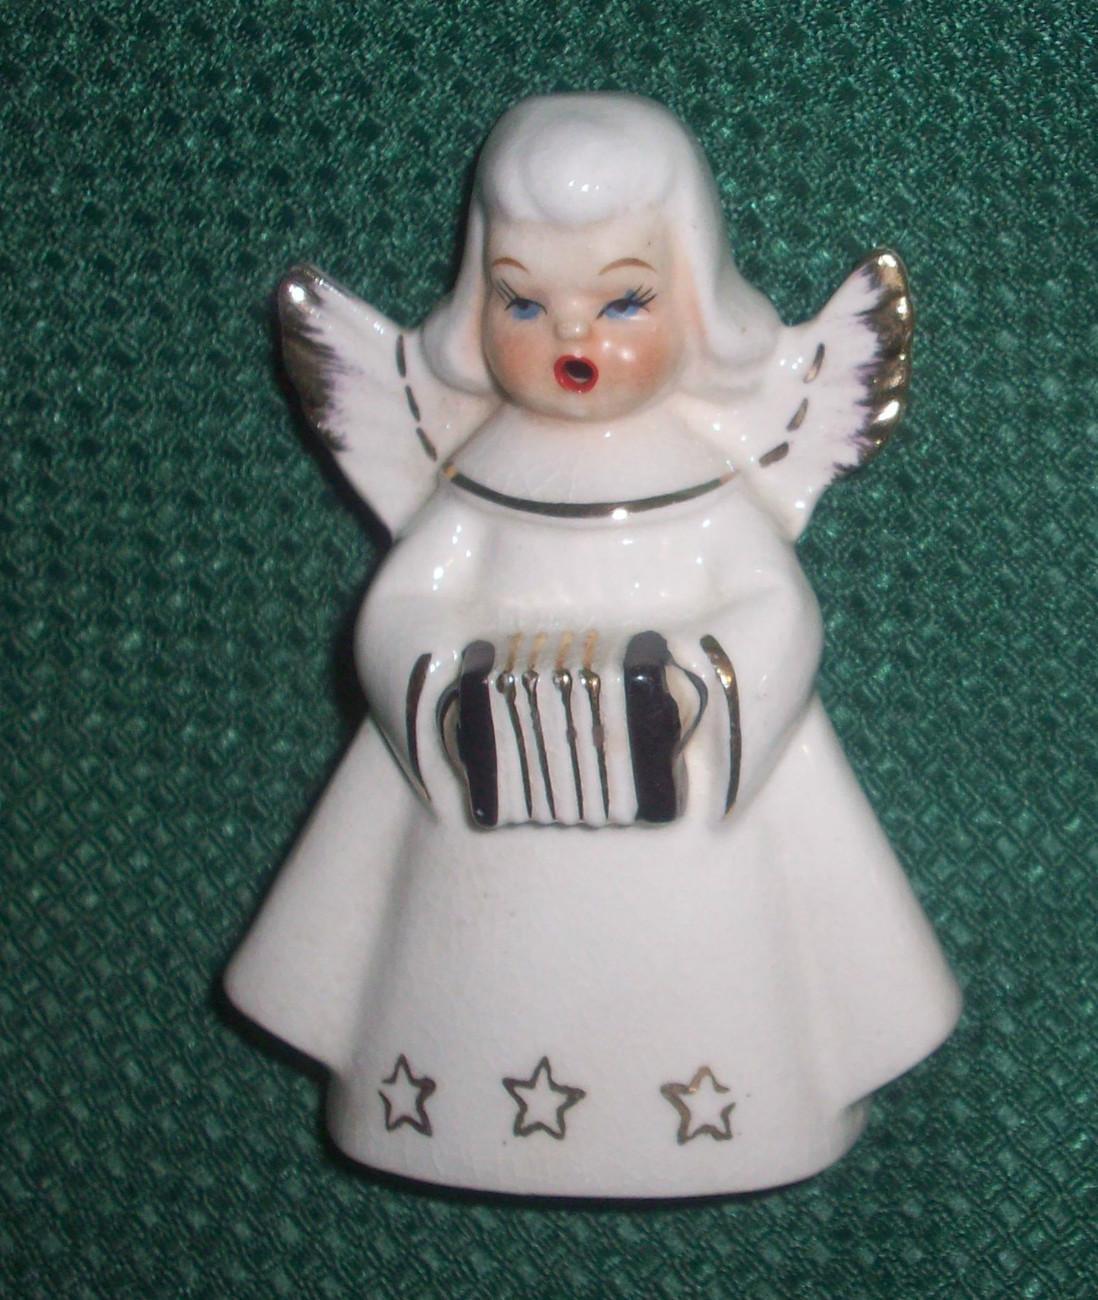 Vintage Ceramic White Angel Singing Musician Figurine with Accordian